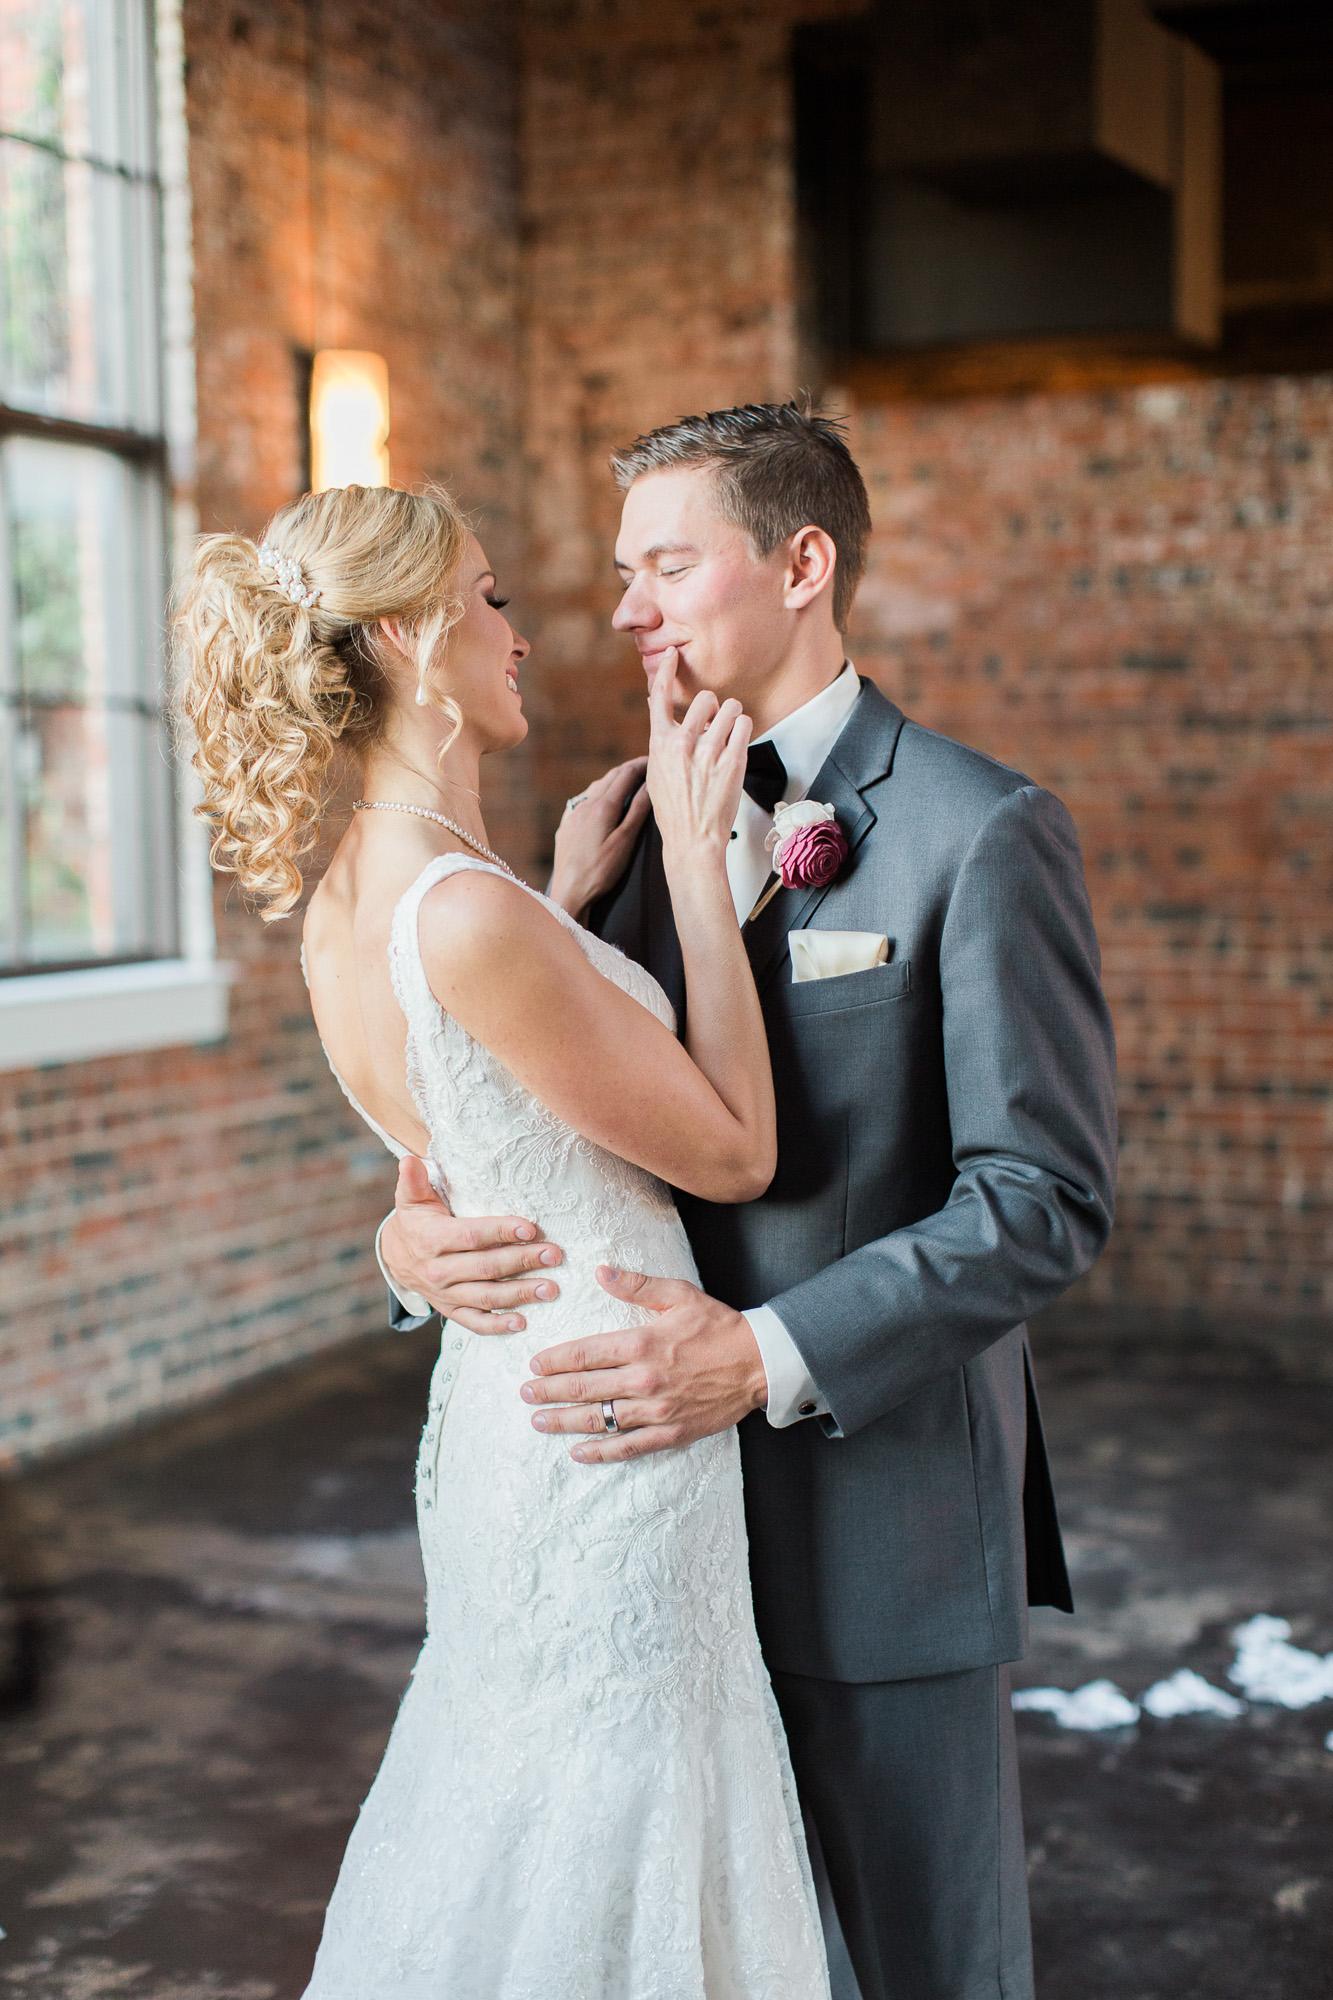 4be90-downtown-bryan-weddingdowntown-bryan-wedding.jpg